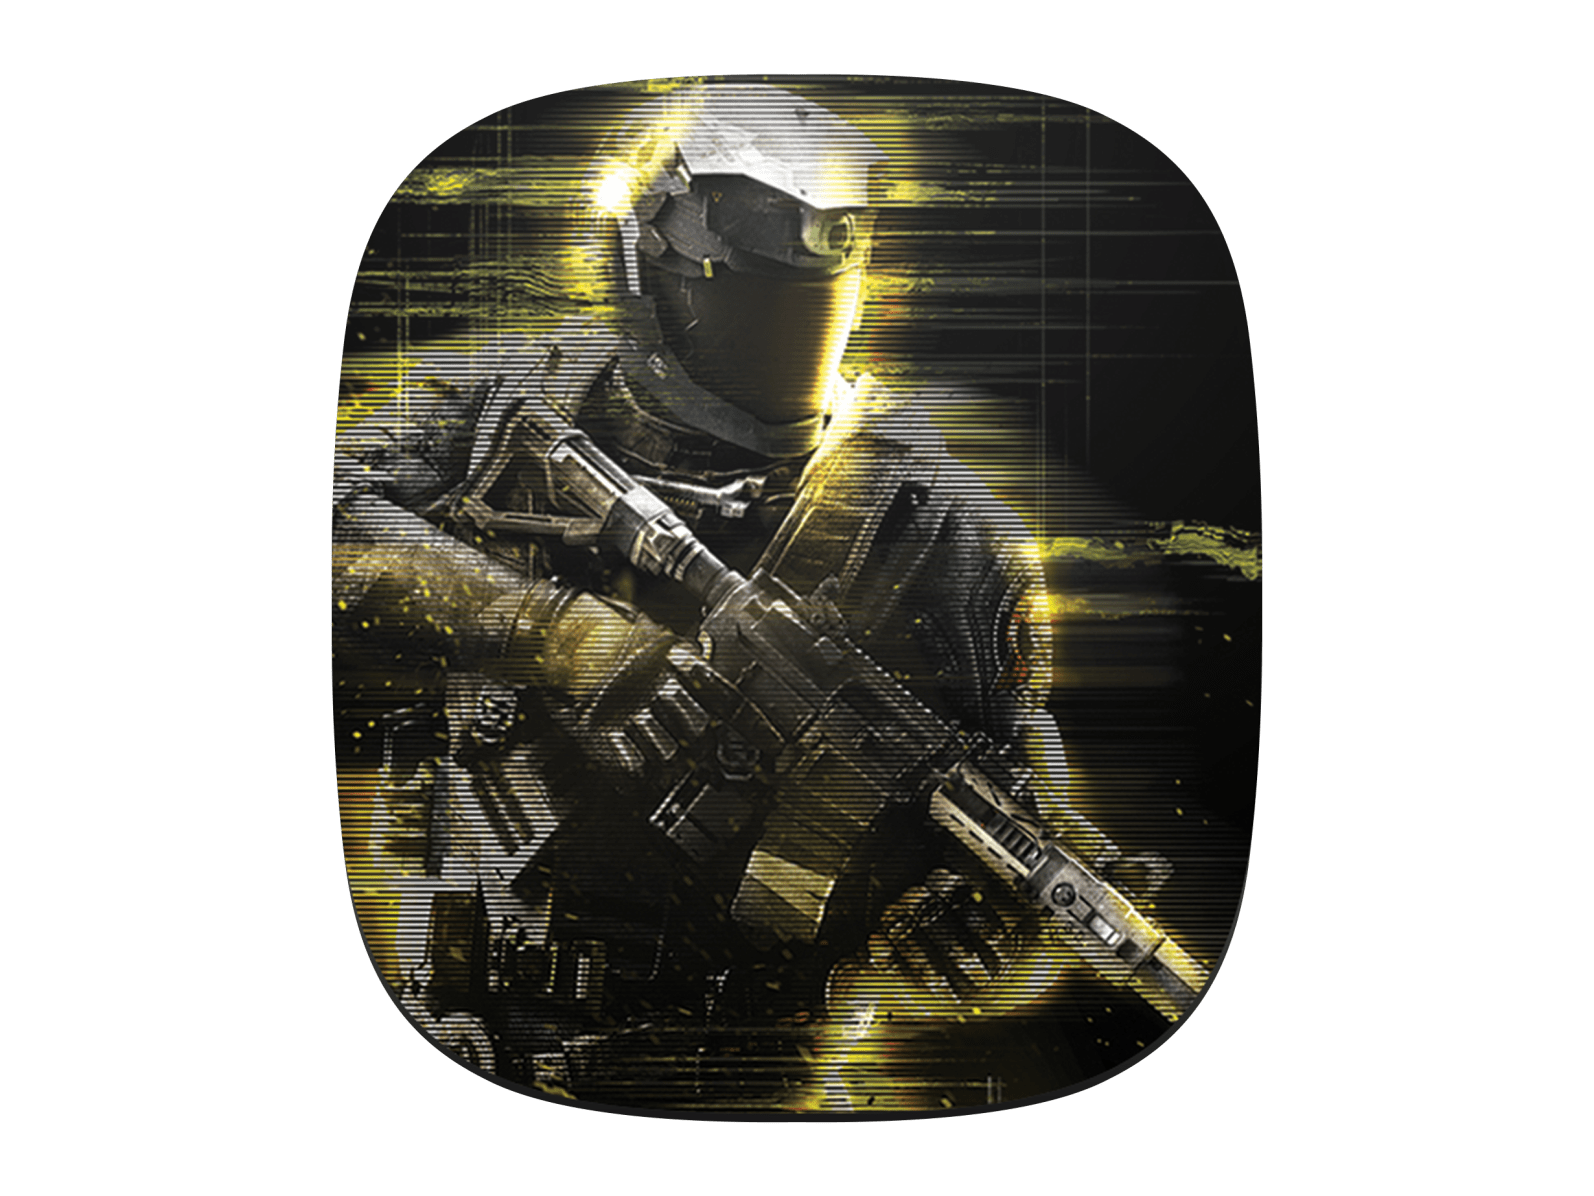 tag-call-of-duty-infinite-warfare-gallery-02